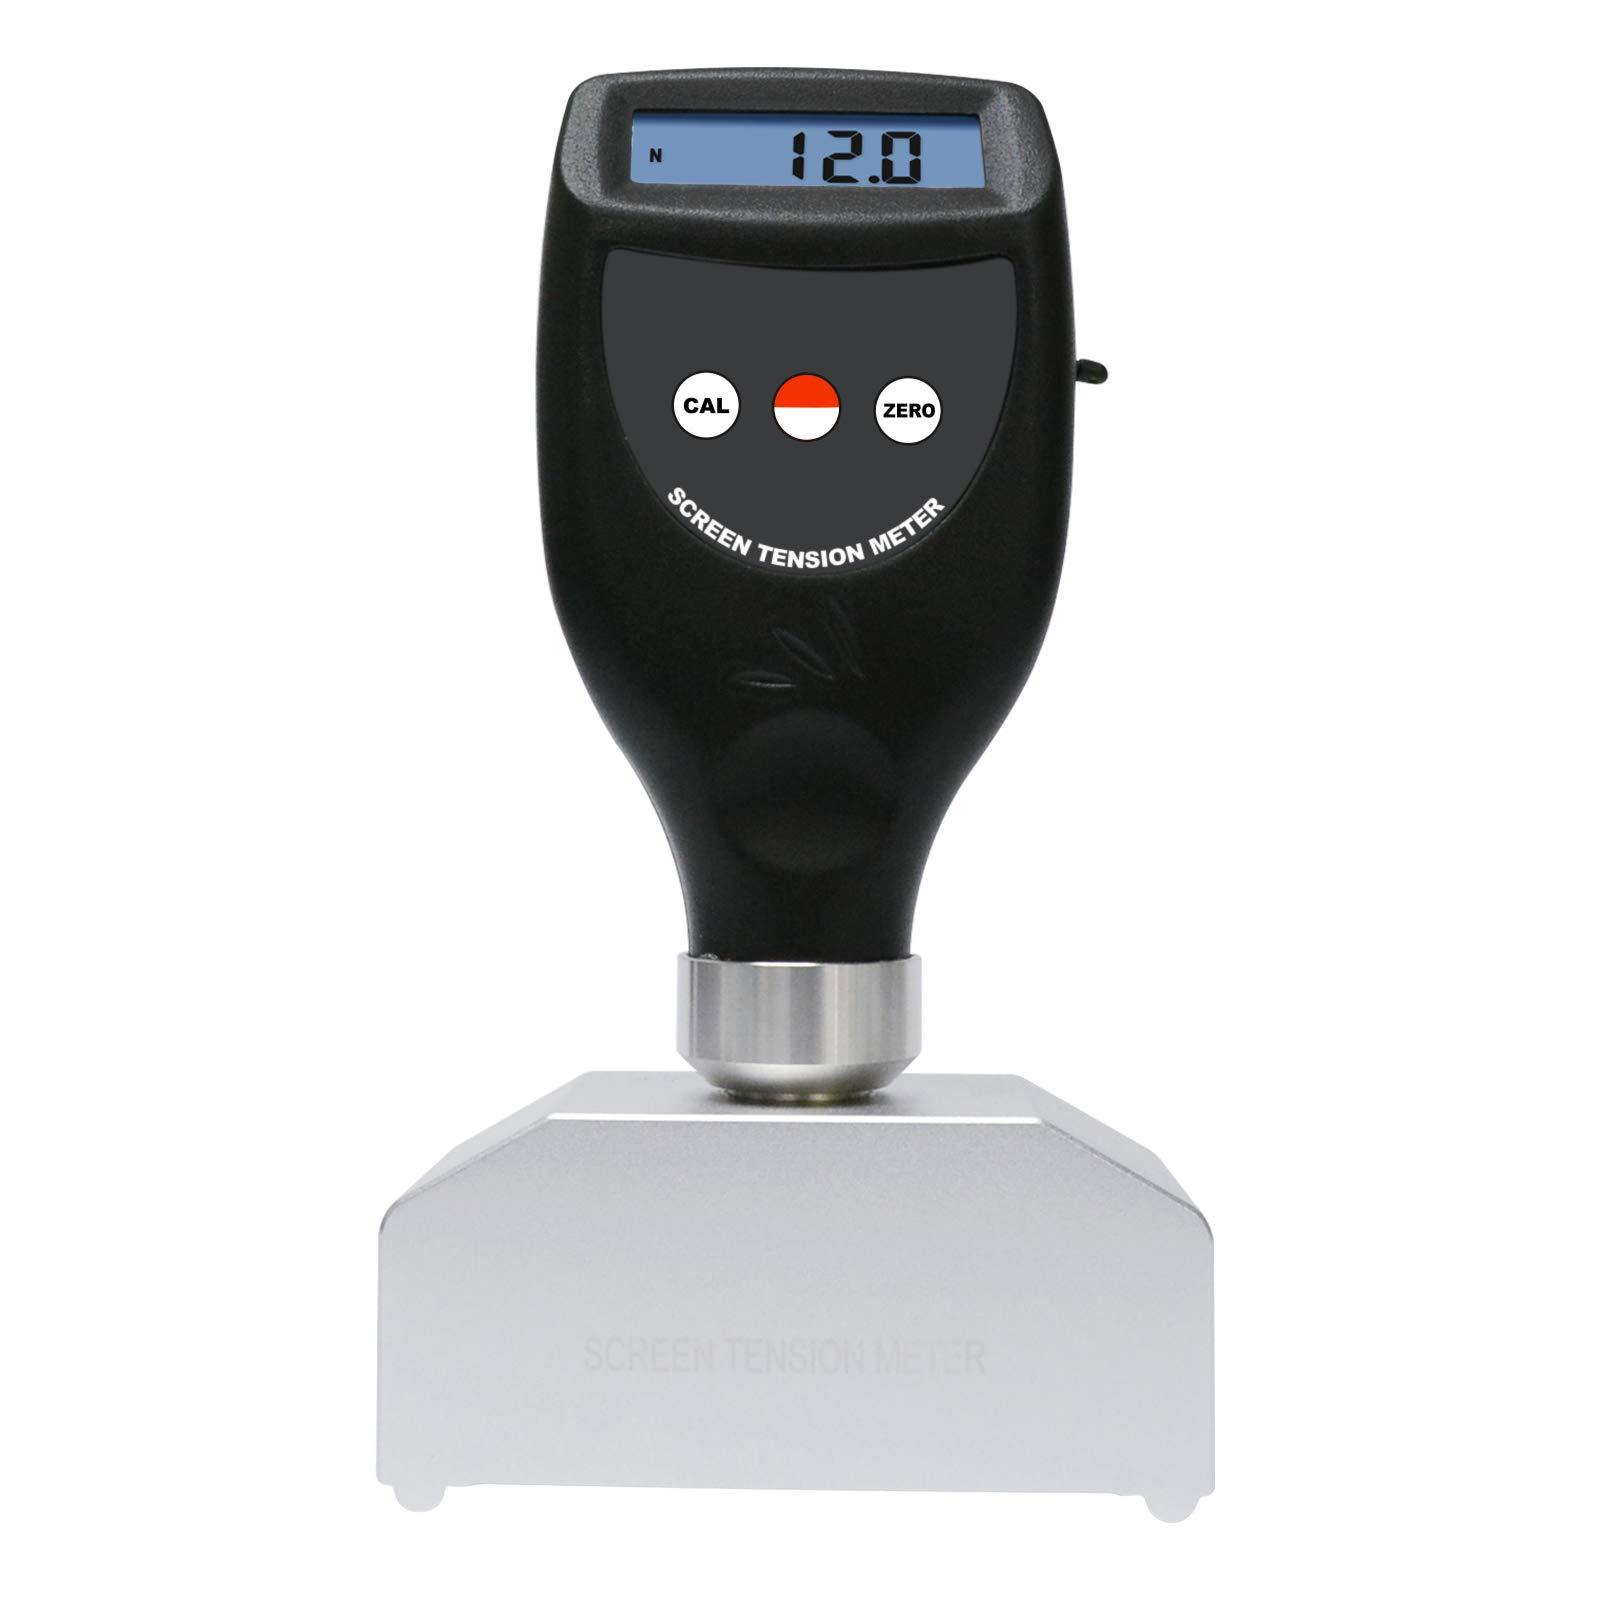 Digital Screen Tension Meter Tester Force Newton Measurement Range 7~40 N/cm for Screen Printing Stencil Production Quality Assurance by Landtek